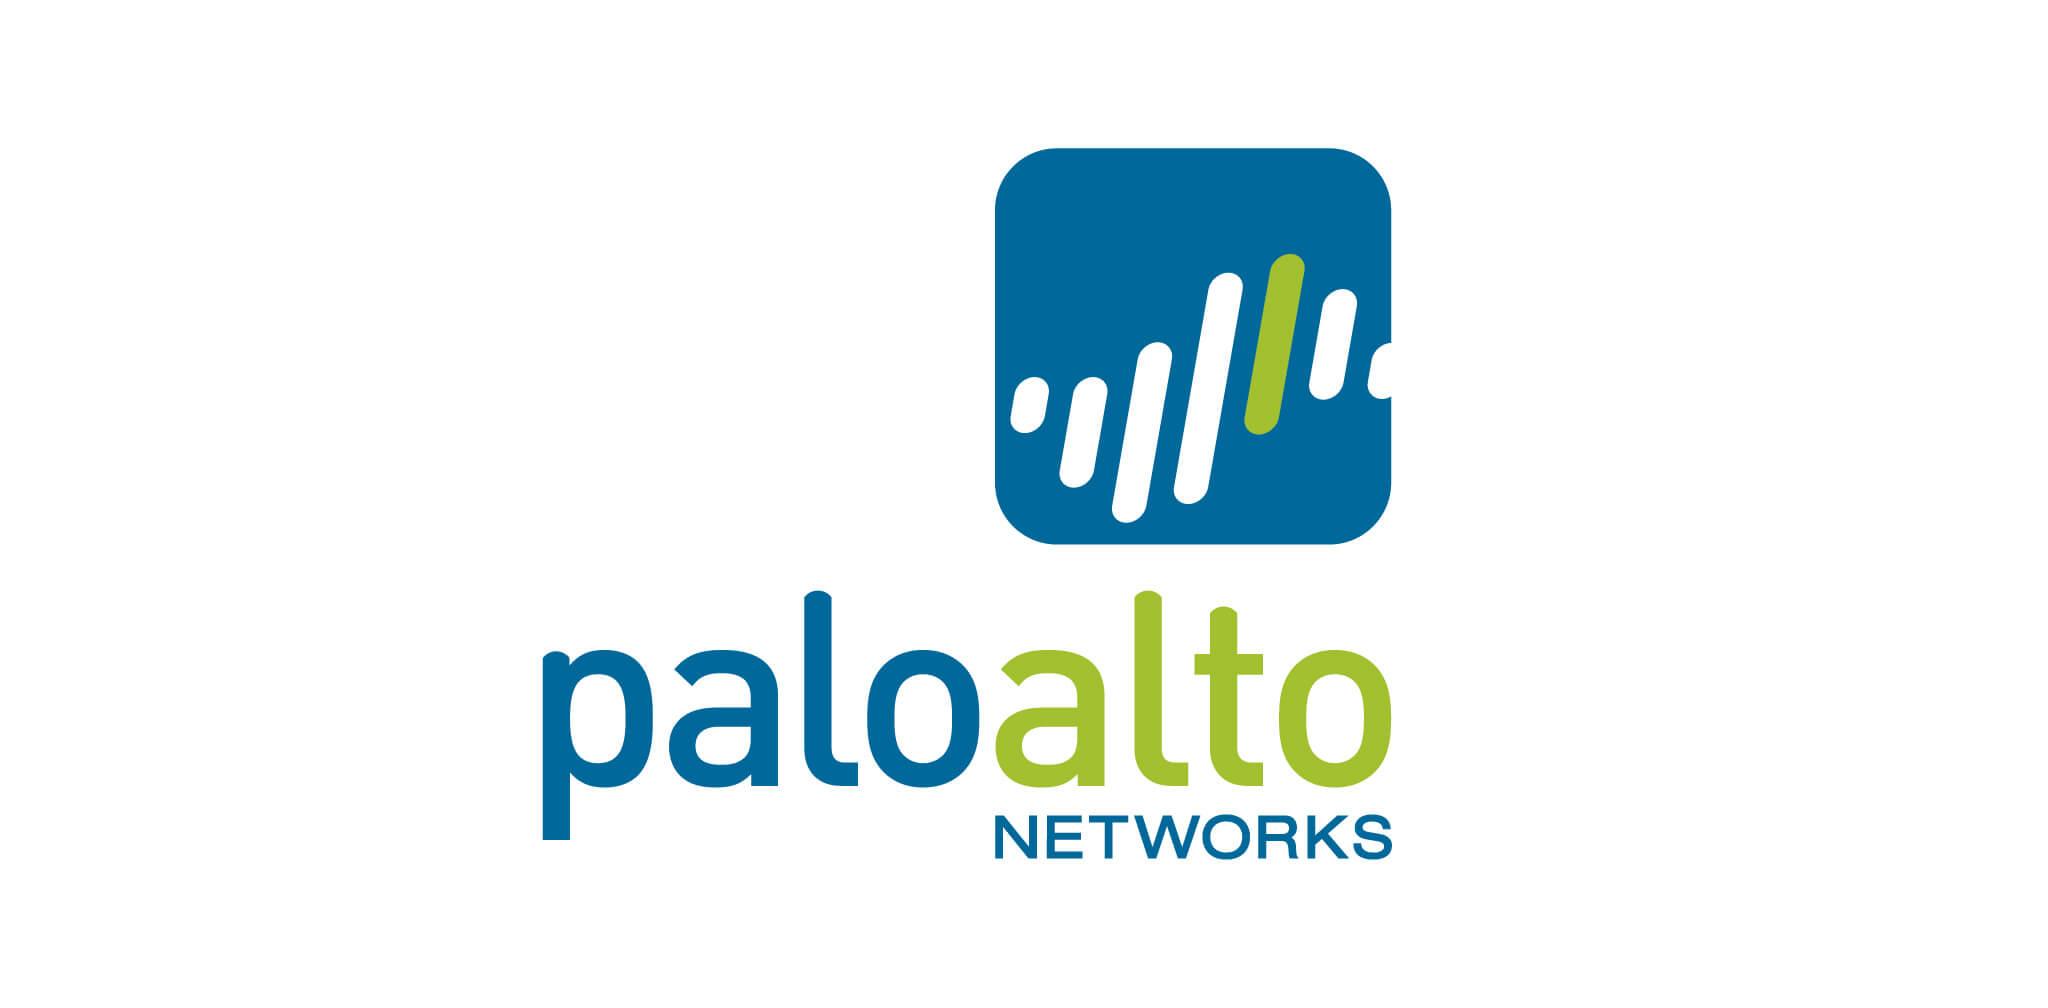 Palo Alto Networks Start Up Branding Designed By 405 Group